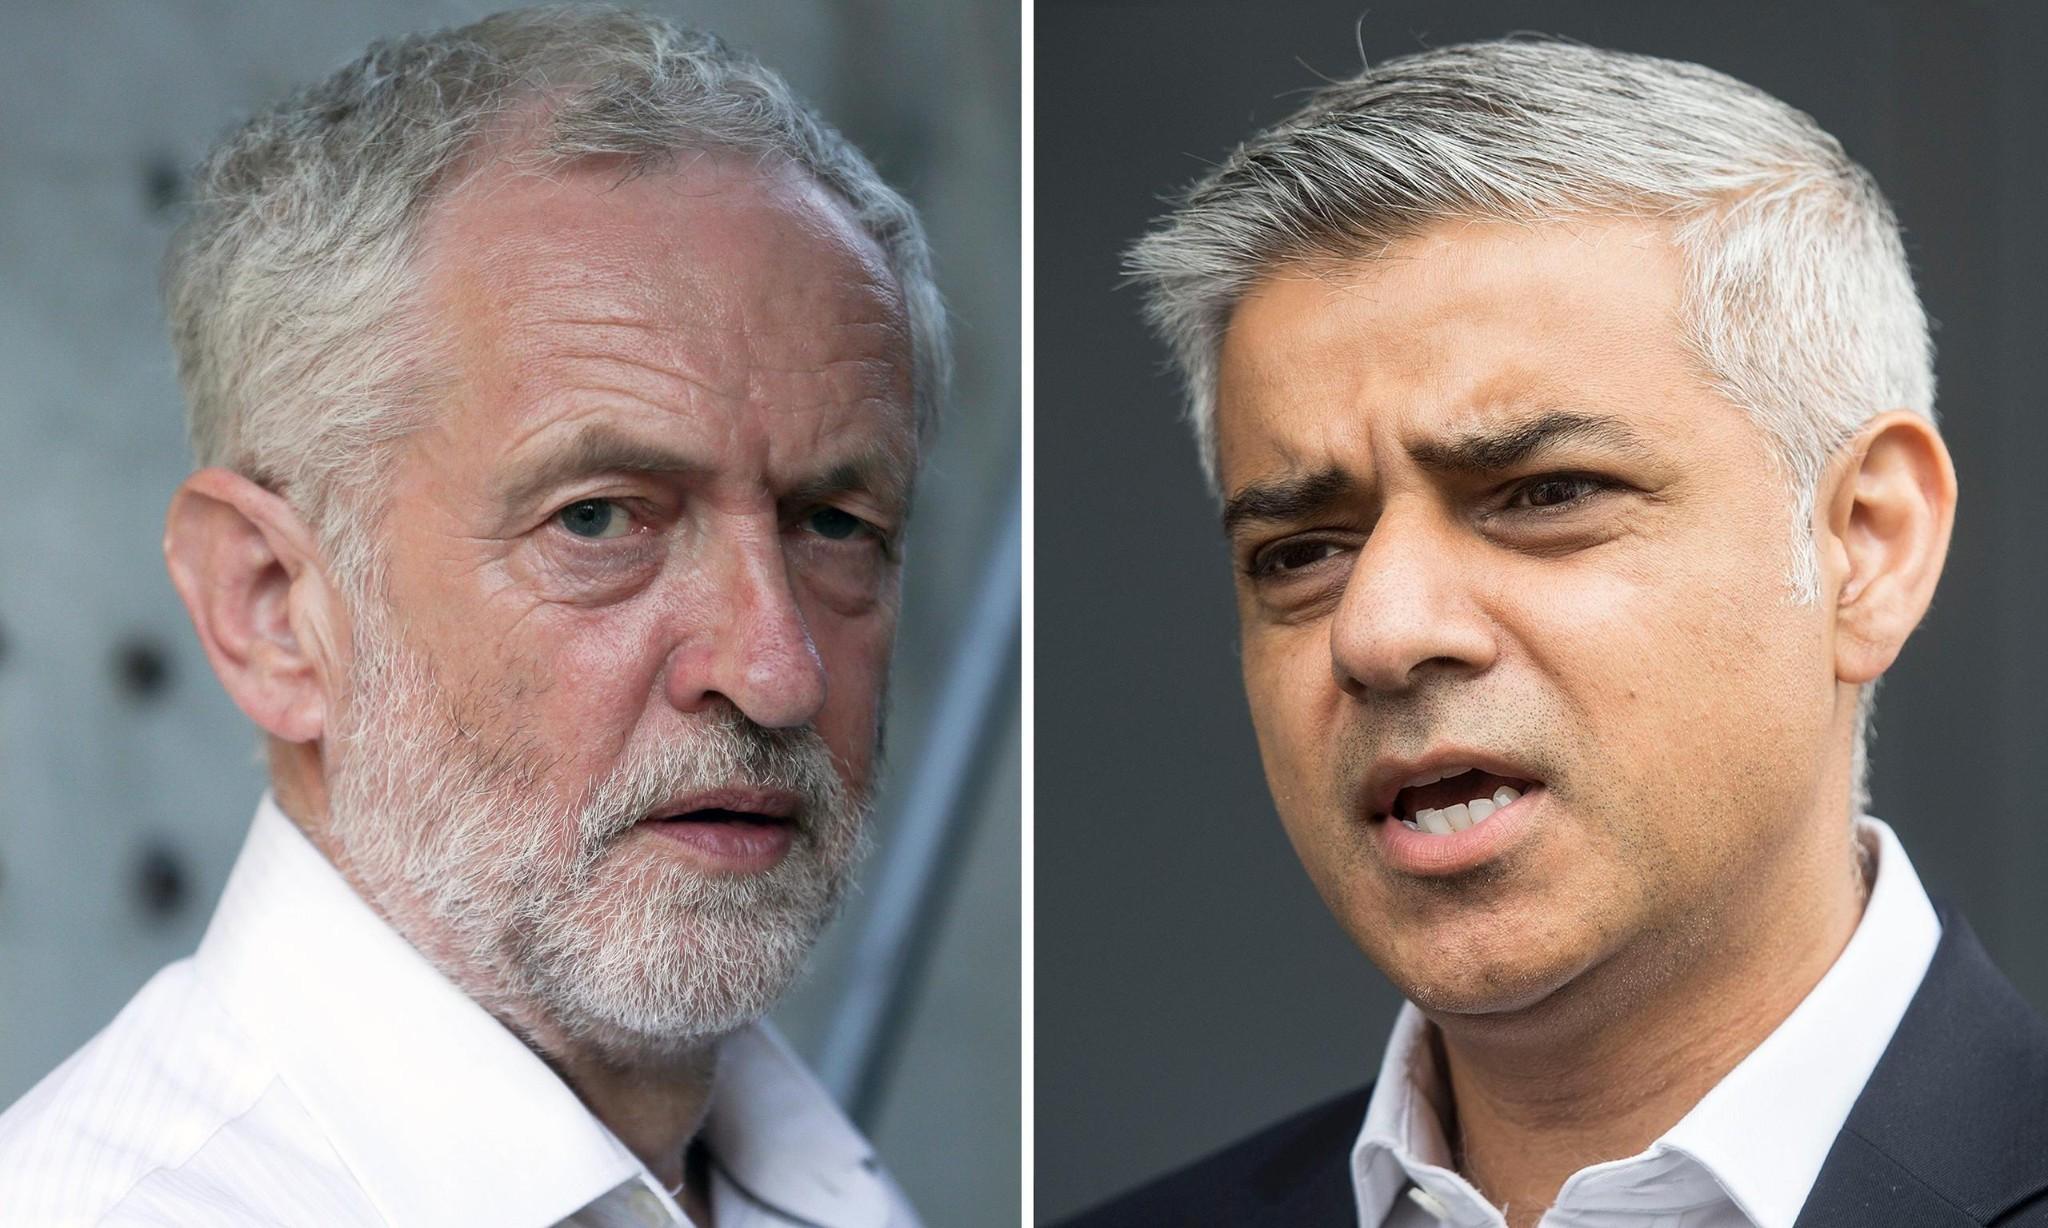 Sadiq Khan tells Labour not to 'faff around' over Ken Livingstone